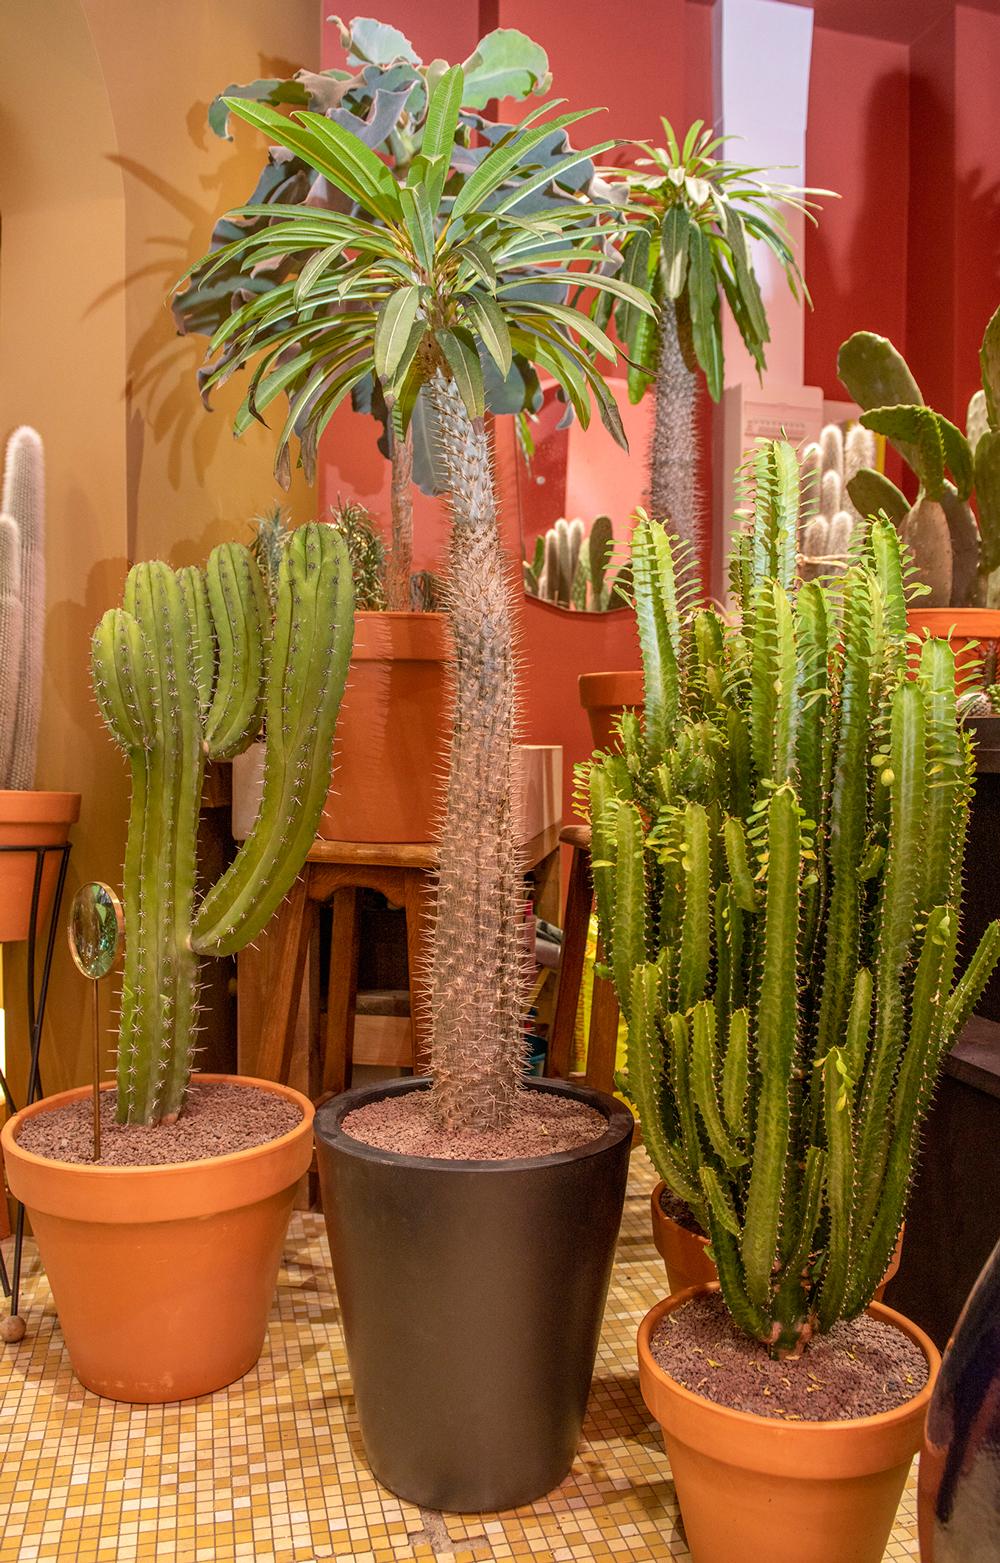 fleuriste-parisien-succulents-cactus-3